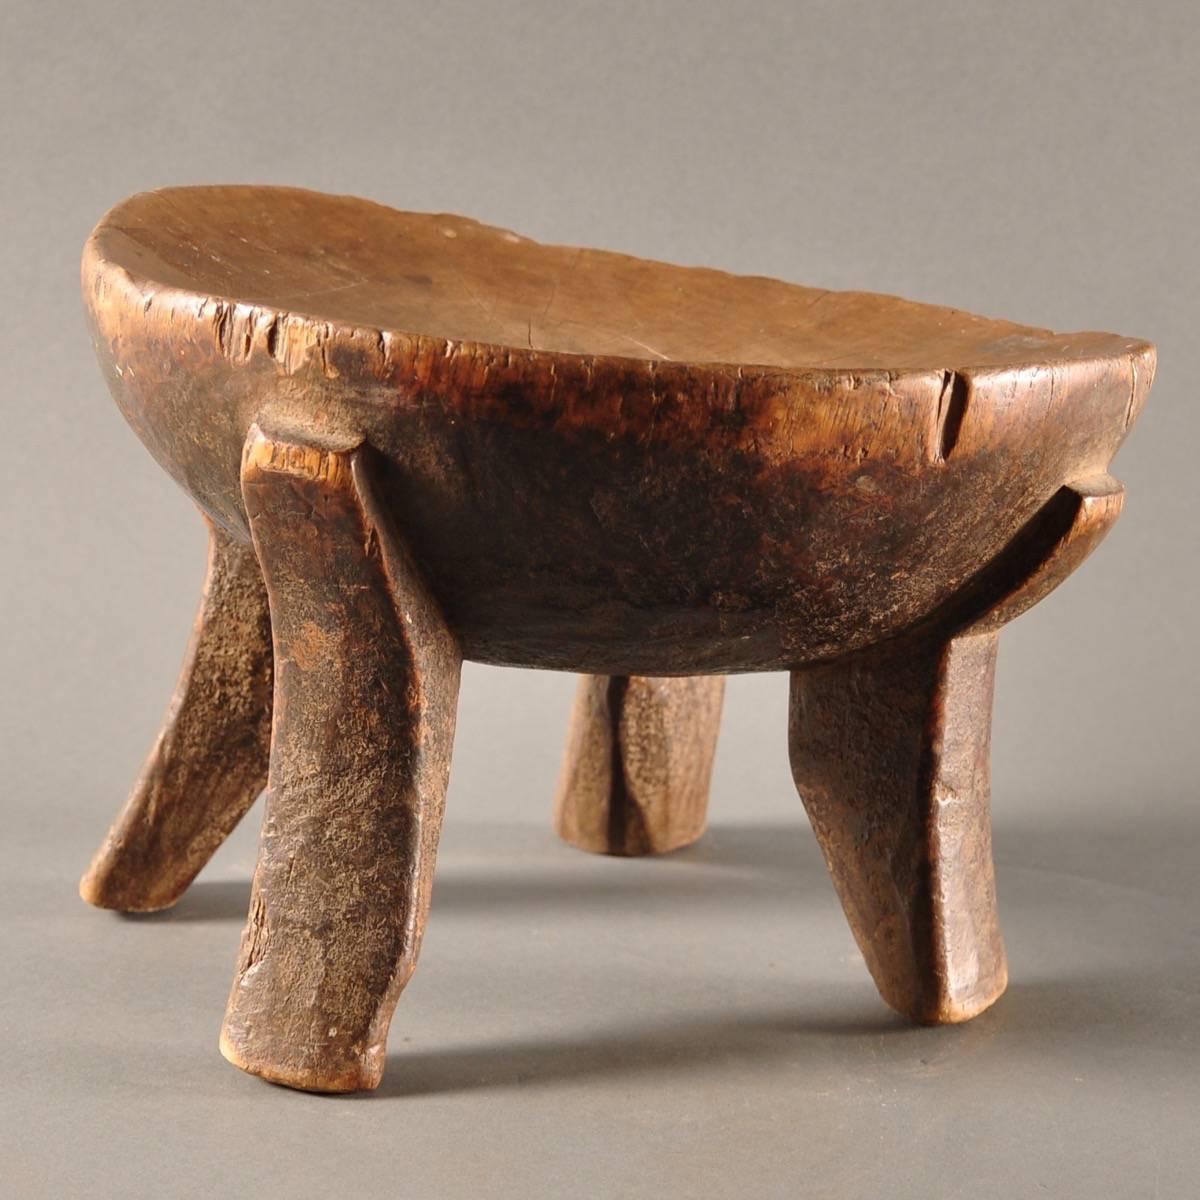 African Tribal Stool De Grande Antique Furniture